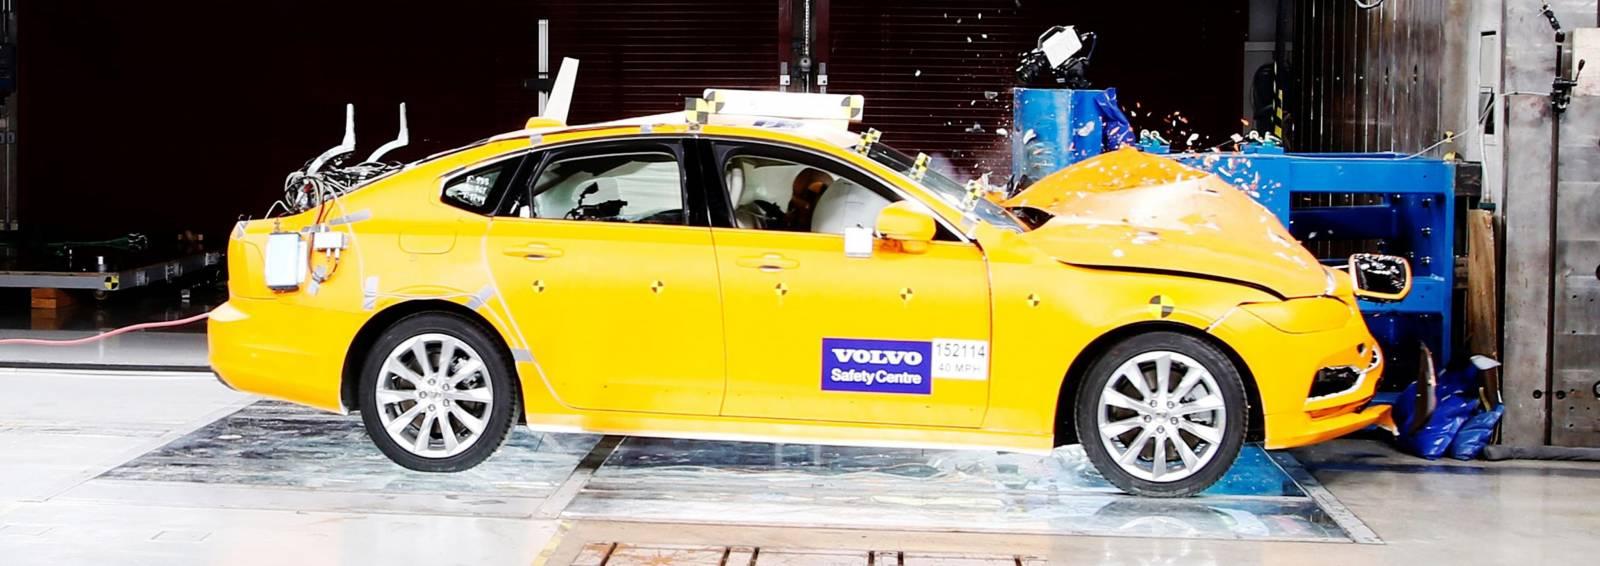 Fotografie vozu Volvo